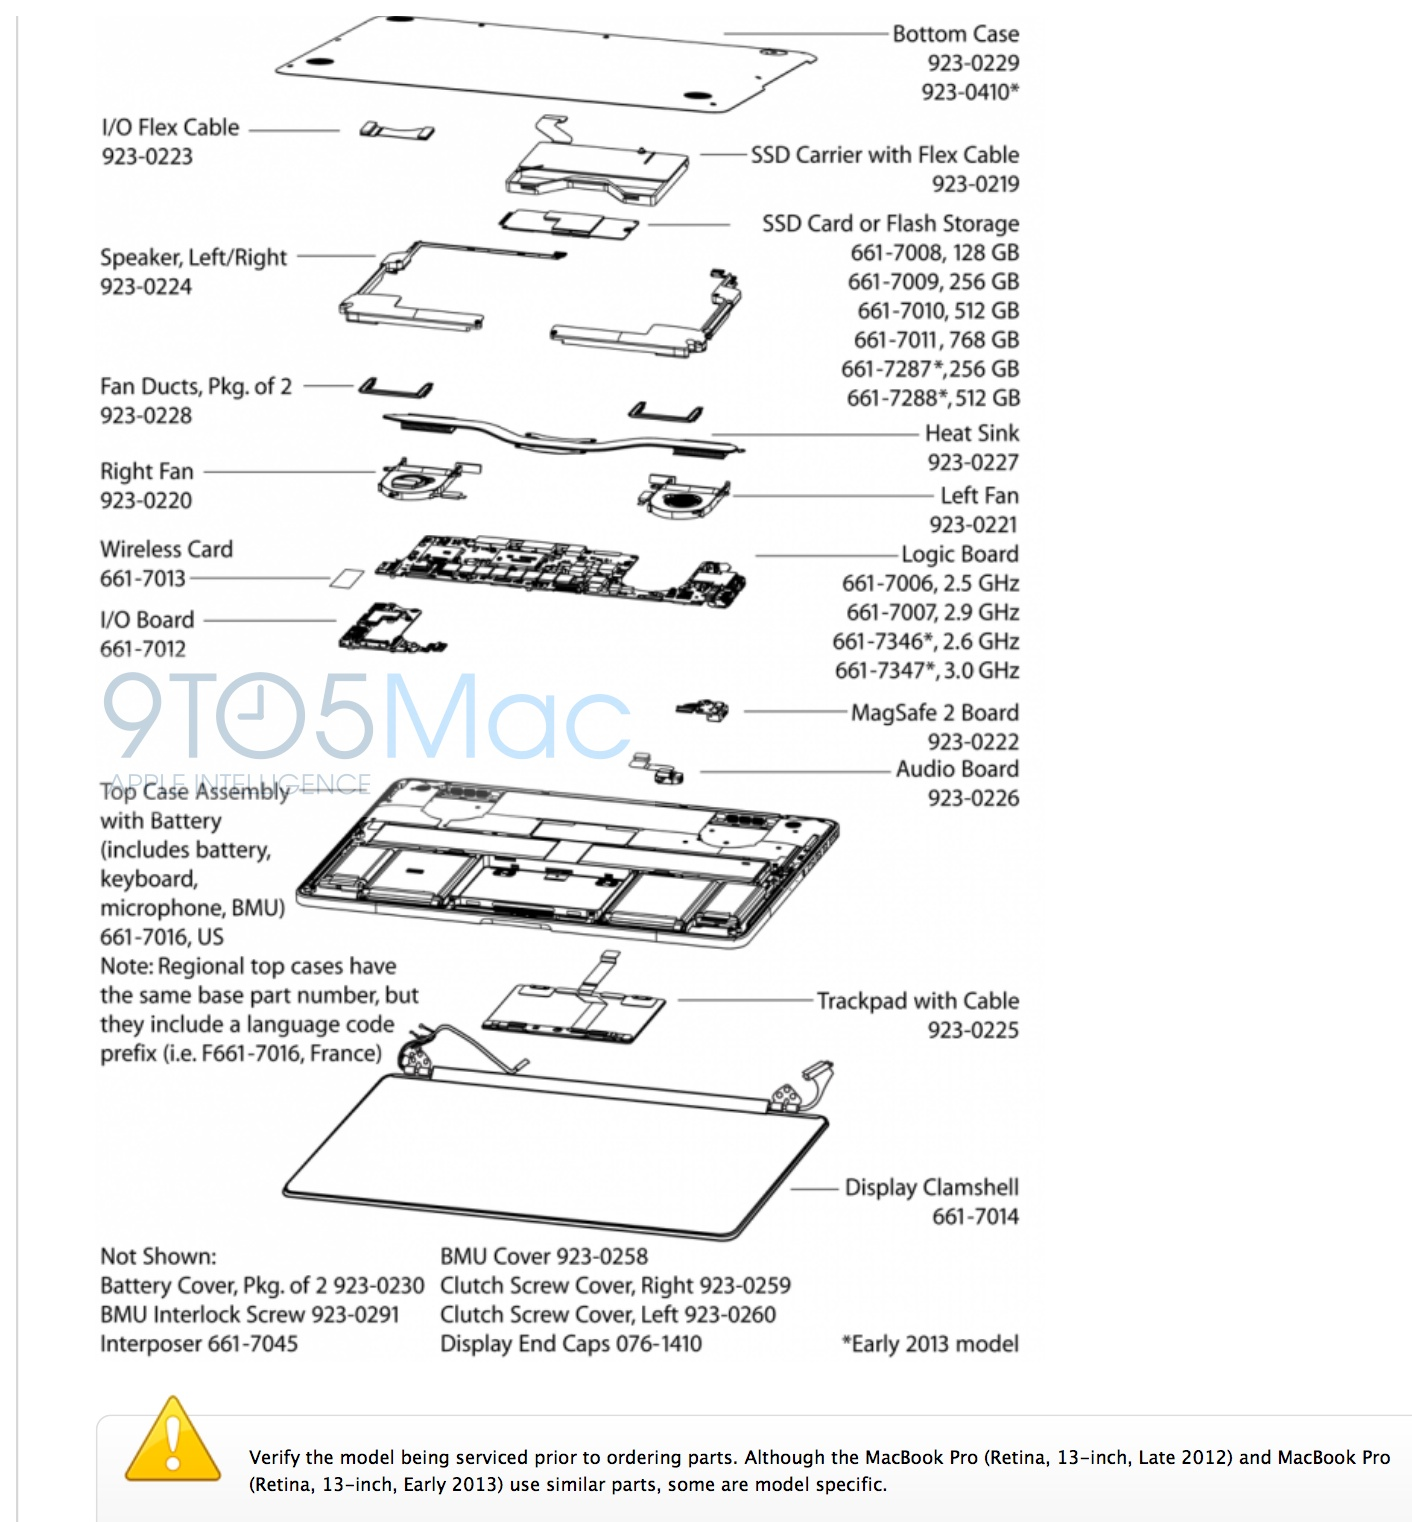 ... mac pro parts diagram diy wiring diagrams \u2022 McCulloch Chainsaw  Manual 13 inch retina macbook